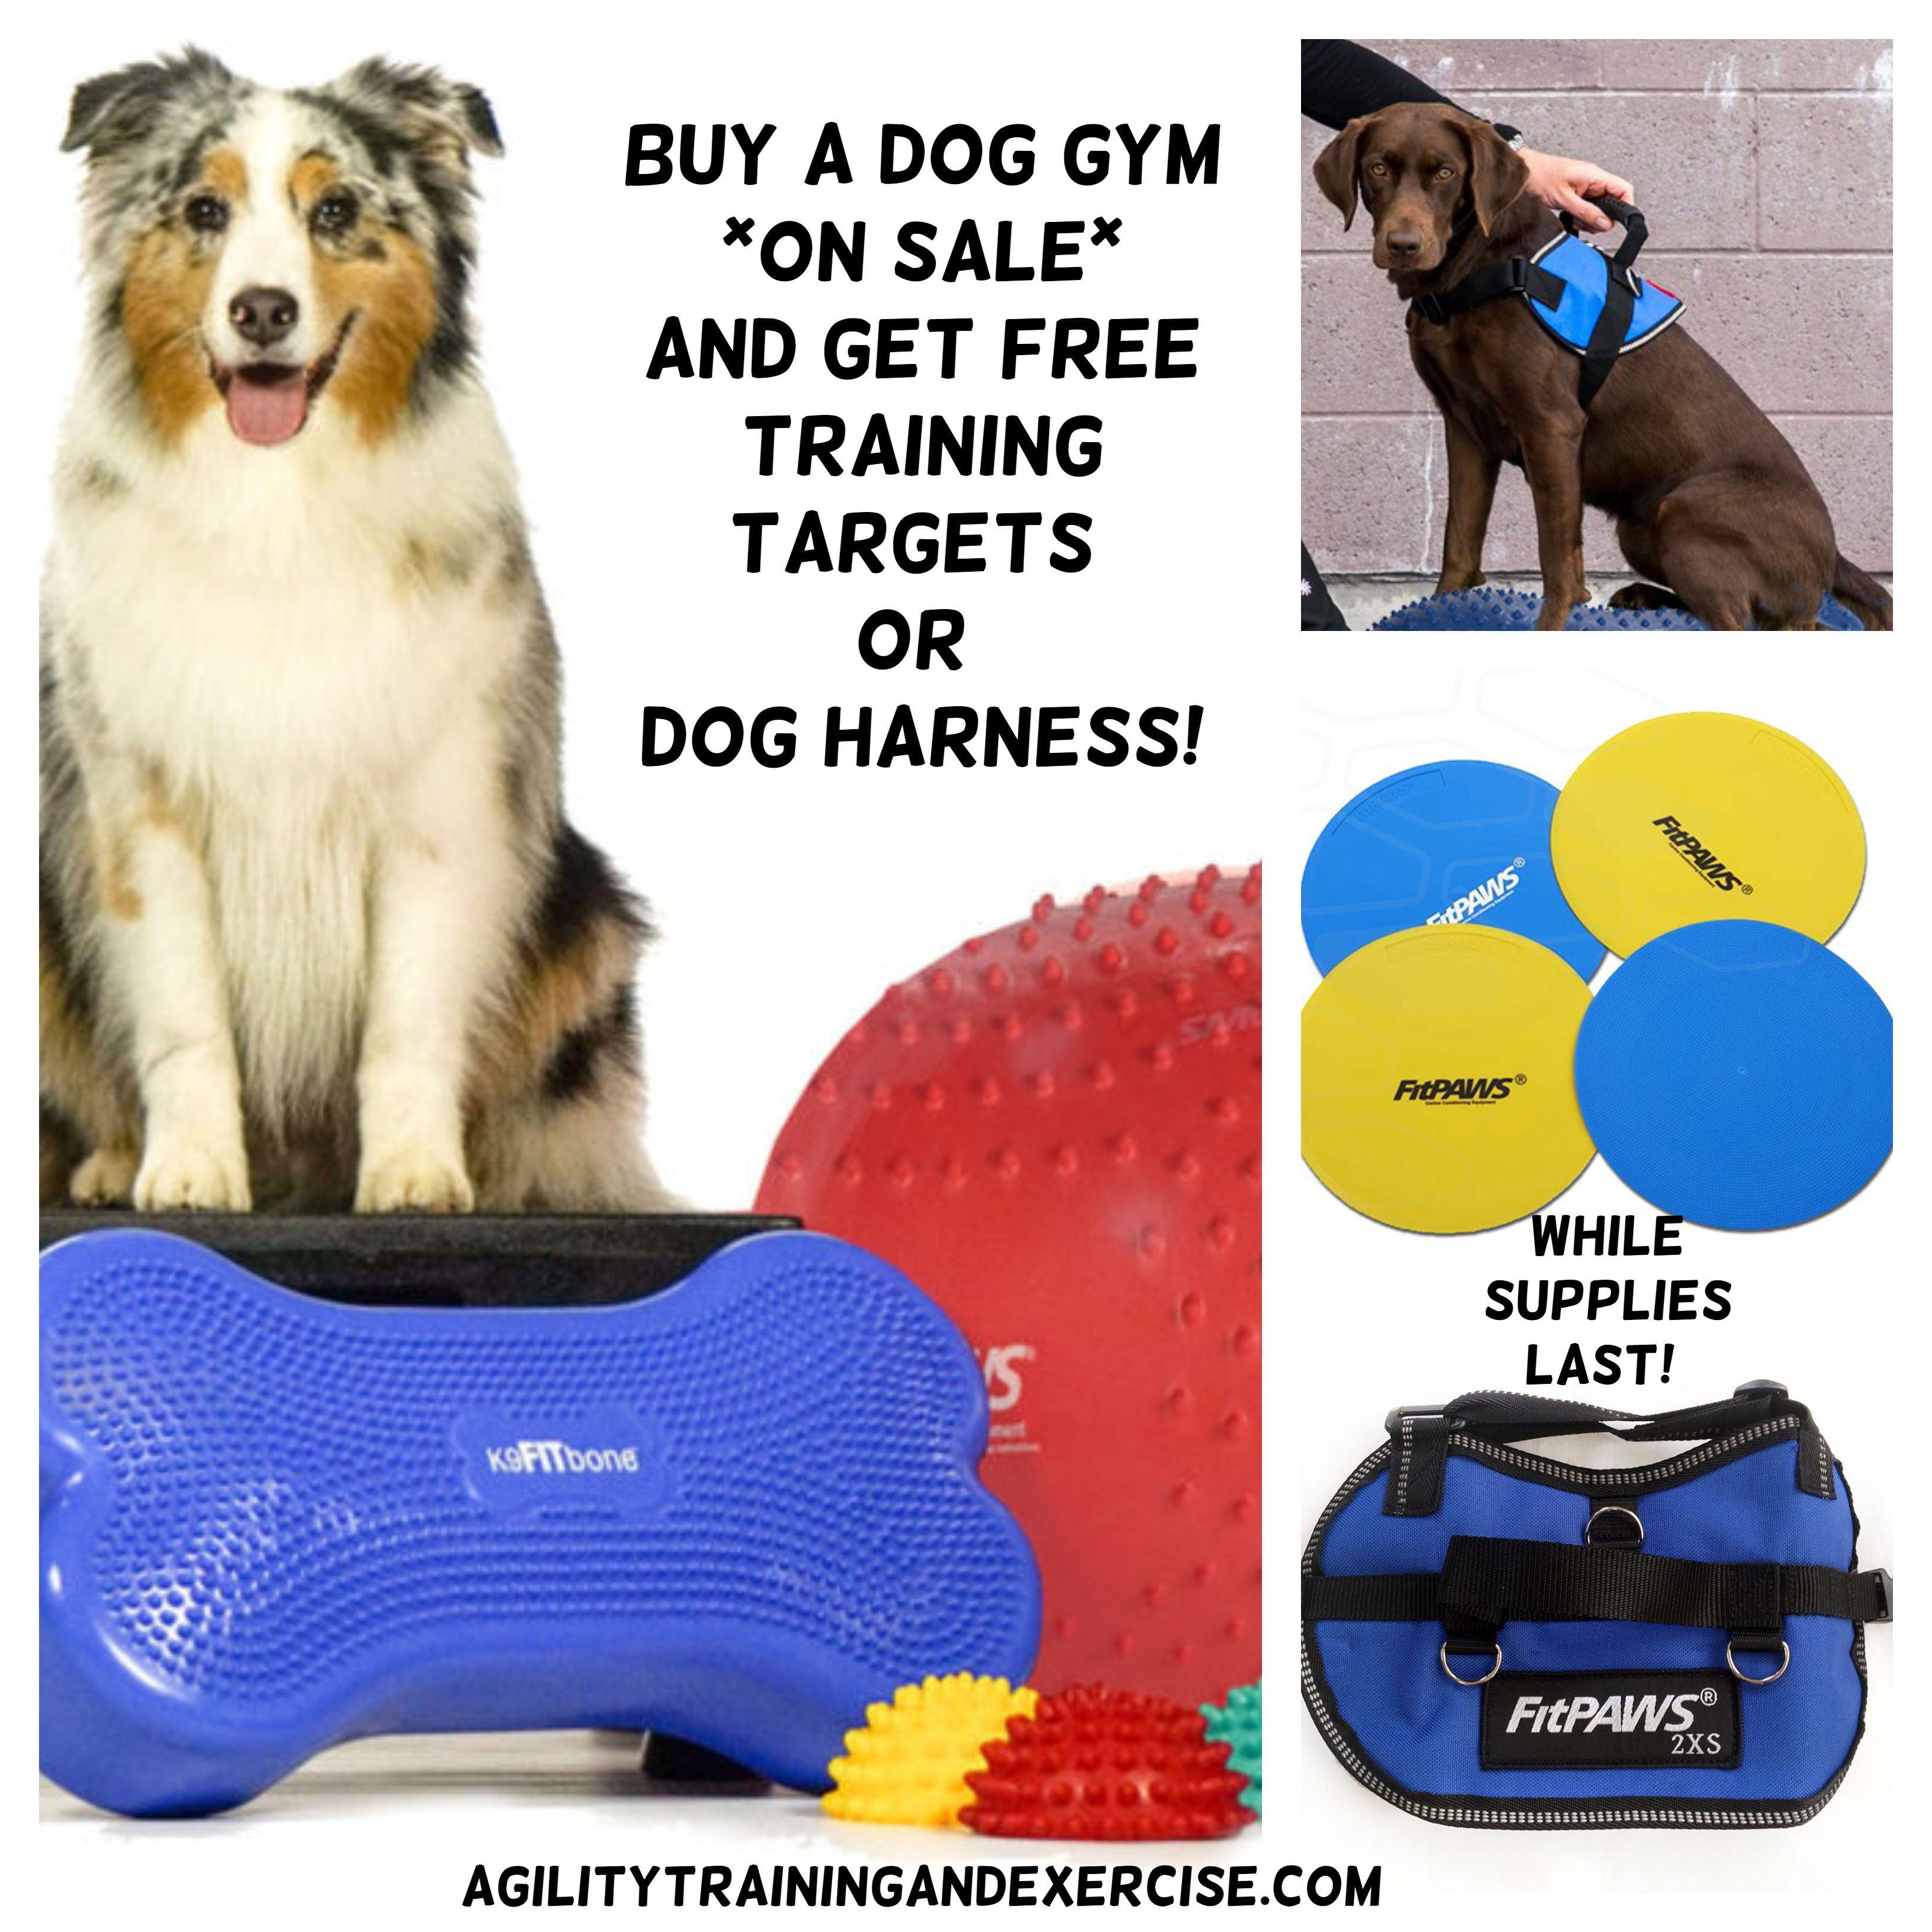 Free Dog Harness Or Training Targets With Dog Gym Purchase Dog Exercise Agility Training For Dogs Dog Training Equipment